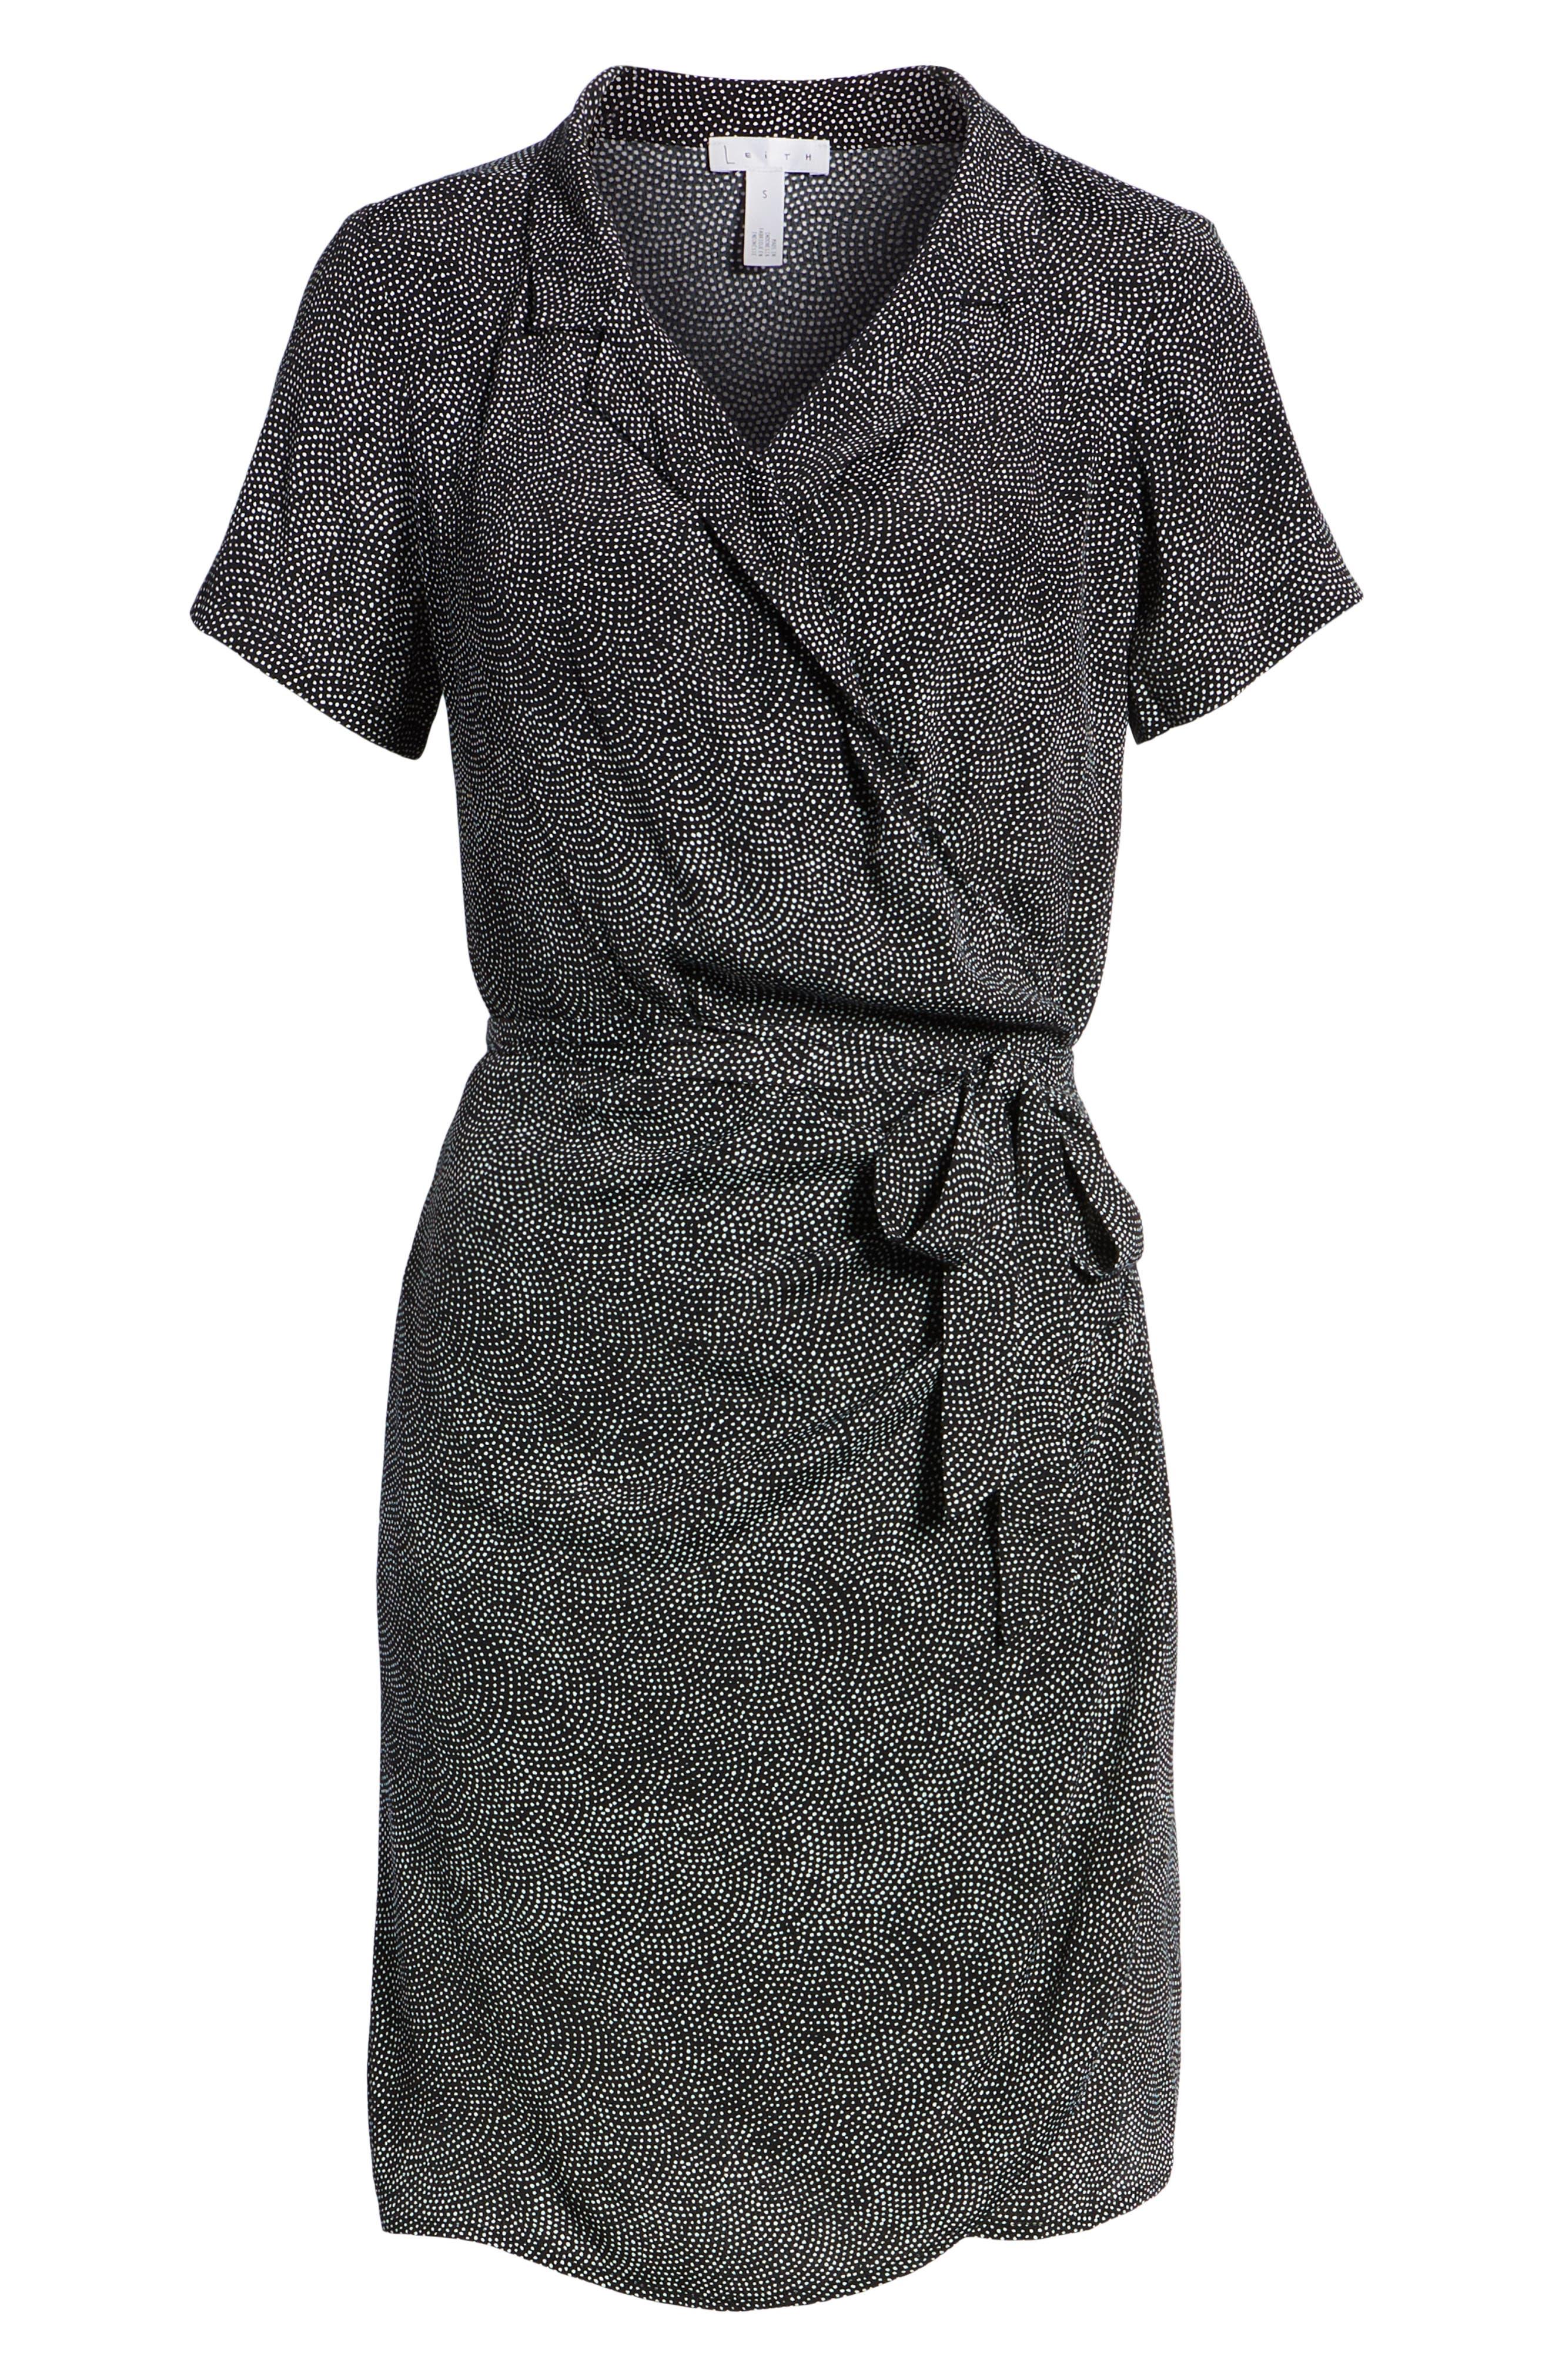 Print Wrap Dress,                             Alternate thumbnail 7, color,                             BLACK CONFETTI PARTY